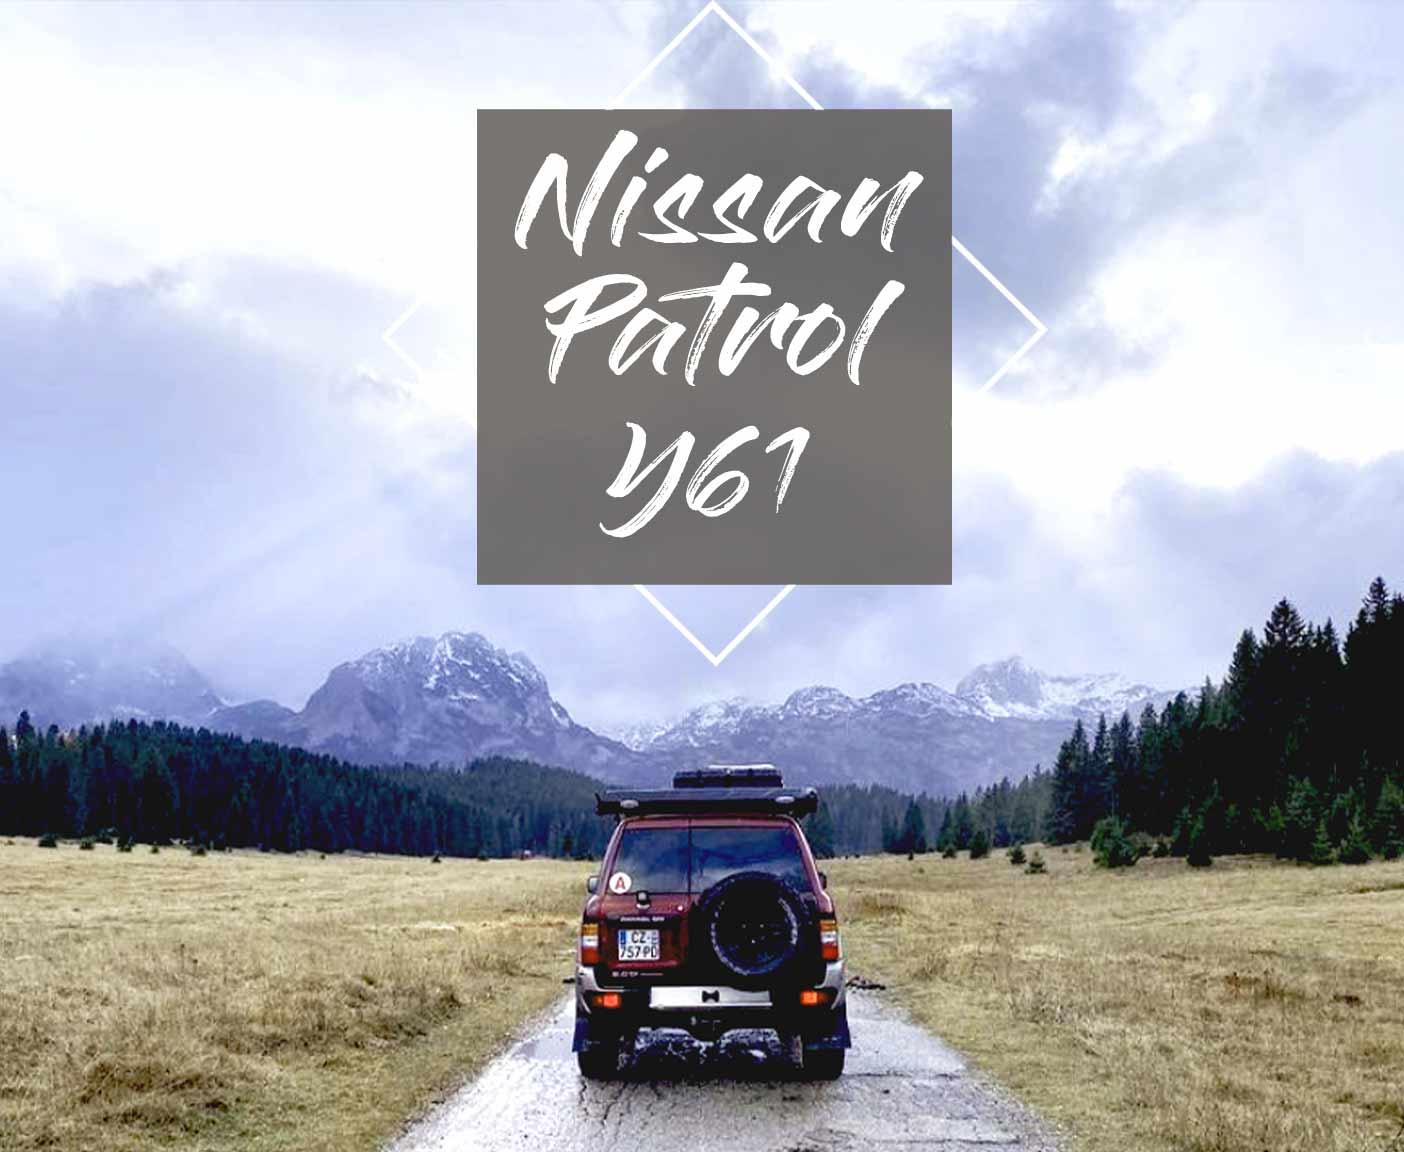 nissan-patrol-gr-y-61-amenage-4x4-tout-terrain-vanlife-roadtrip-tour-du-monde-europe-offroad